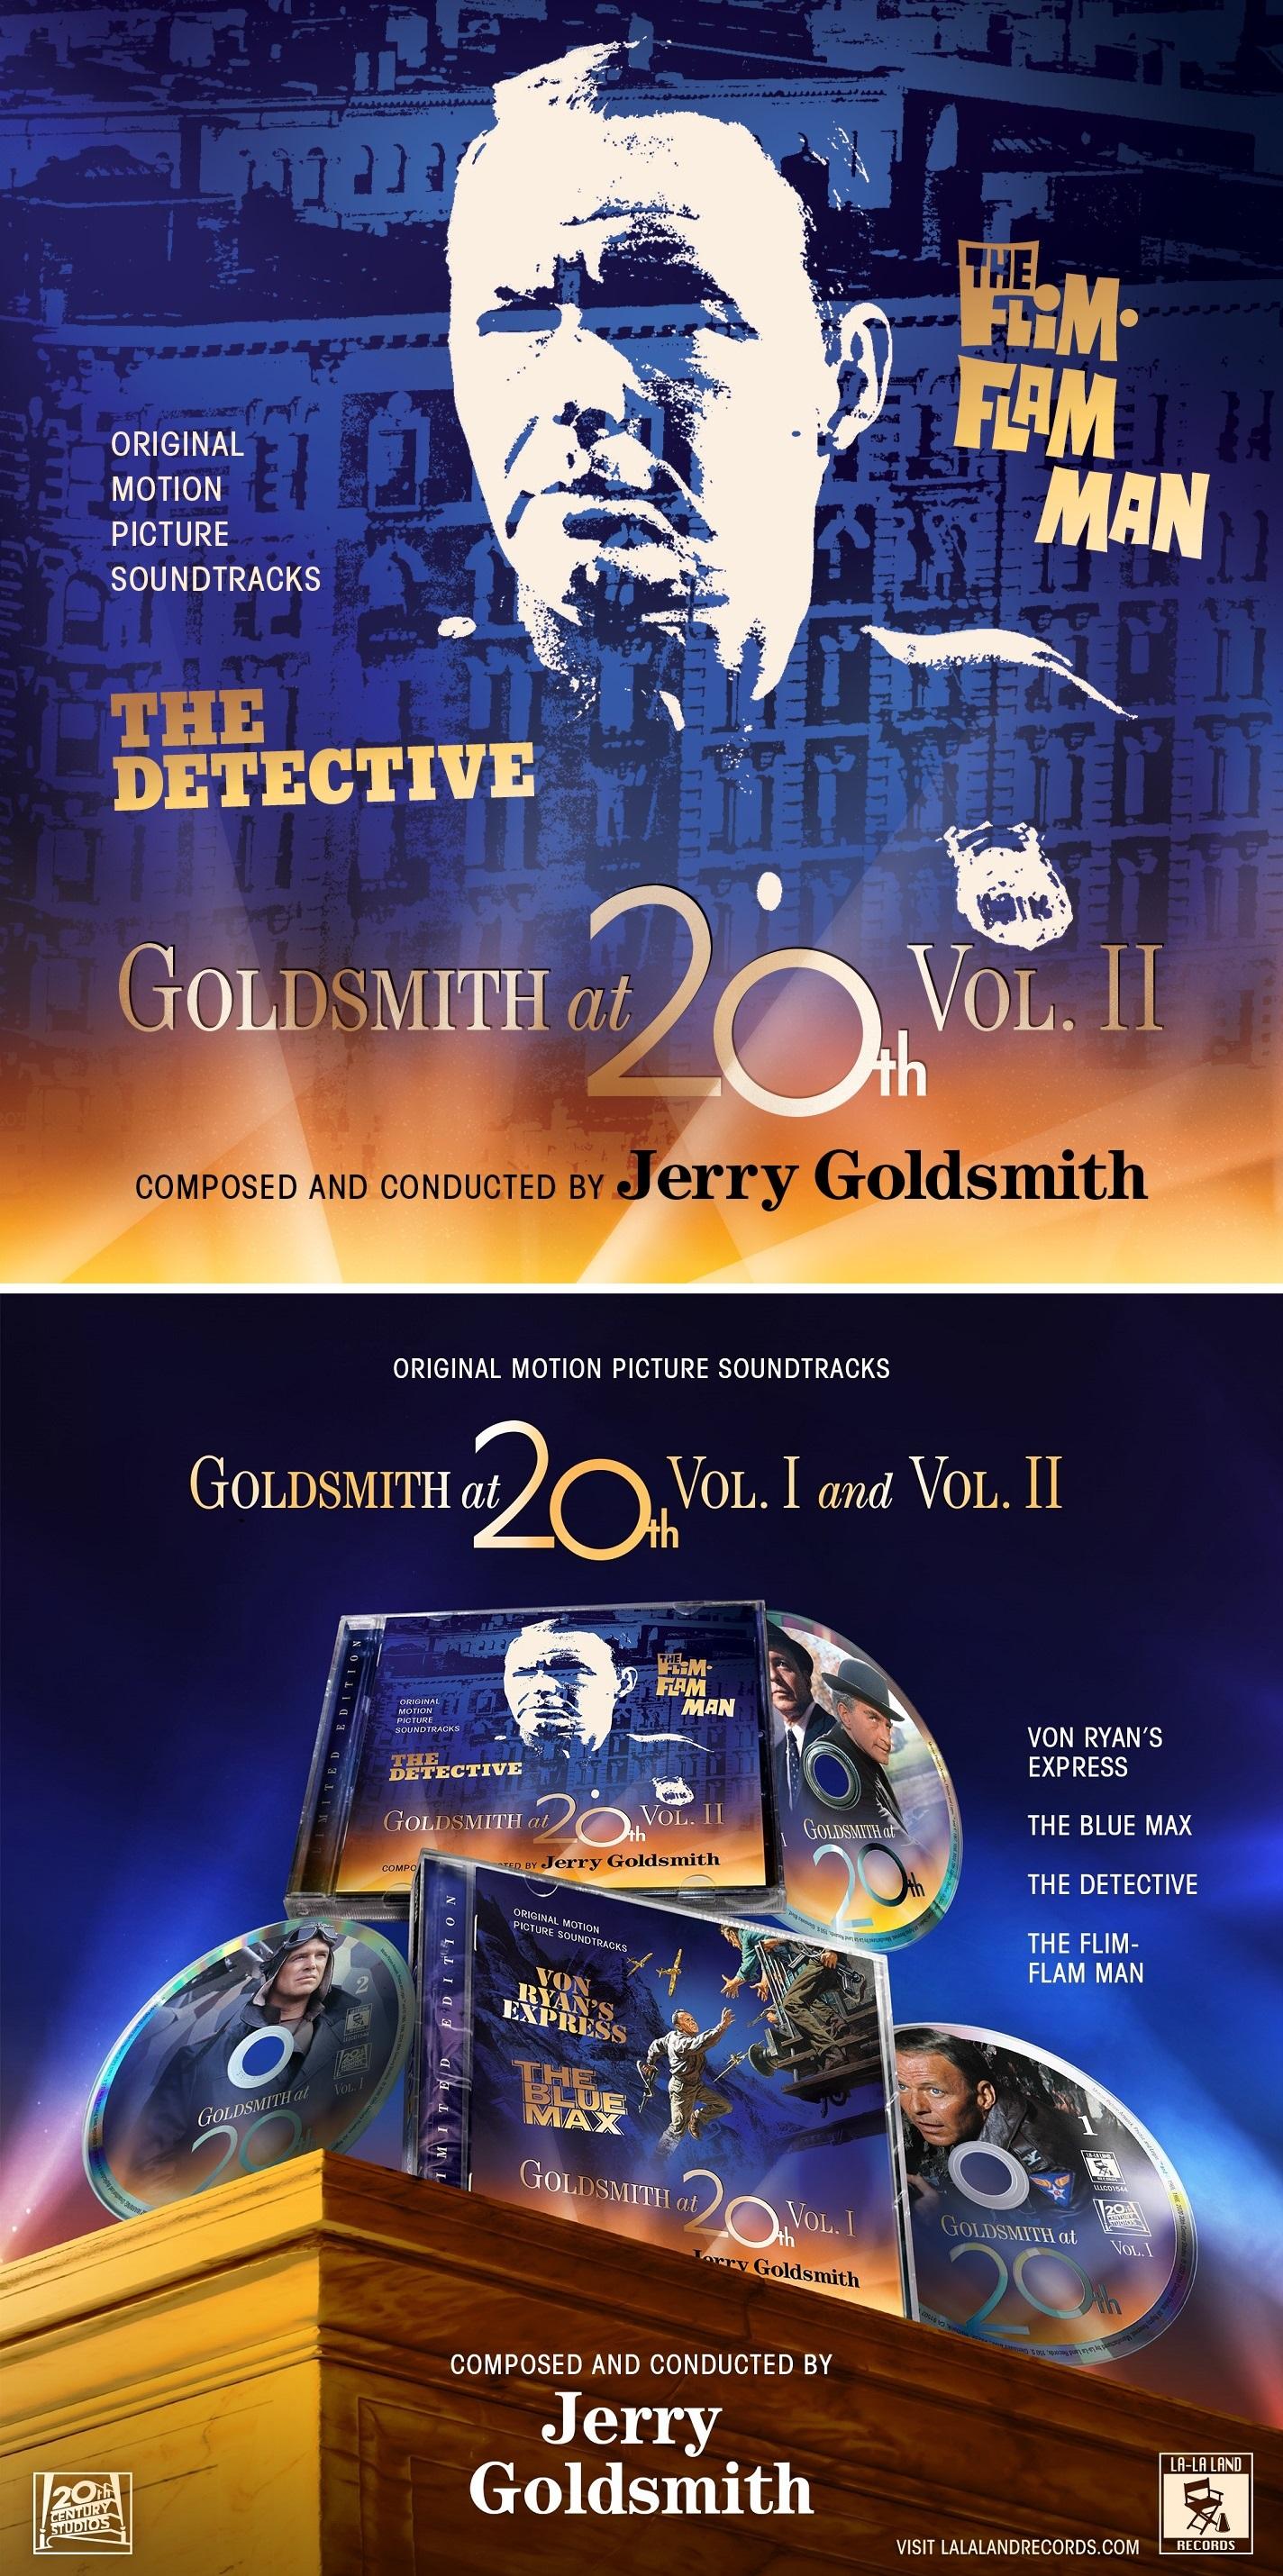 Goldsmith At 20th Vol. 2 – The Detective / The Flim-Flam Man